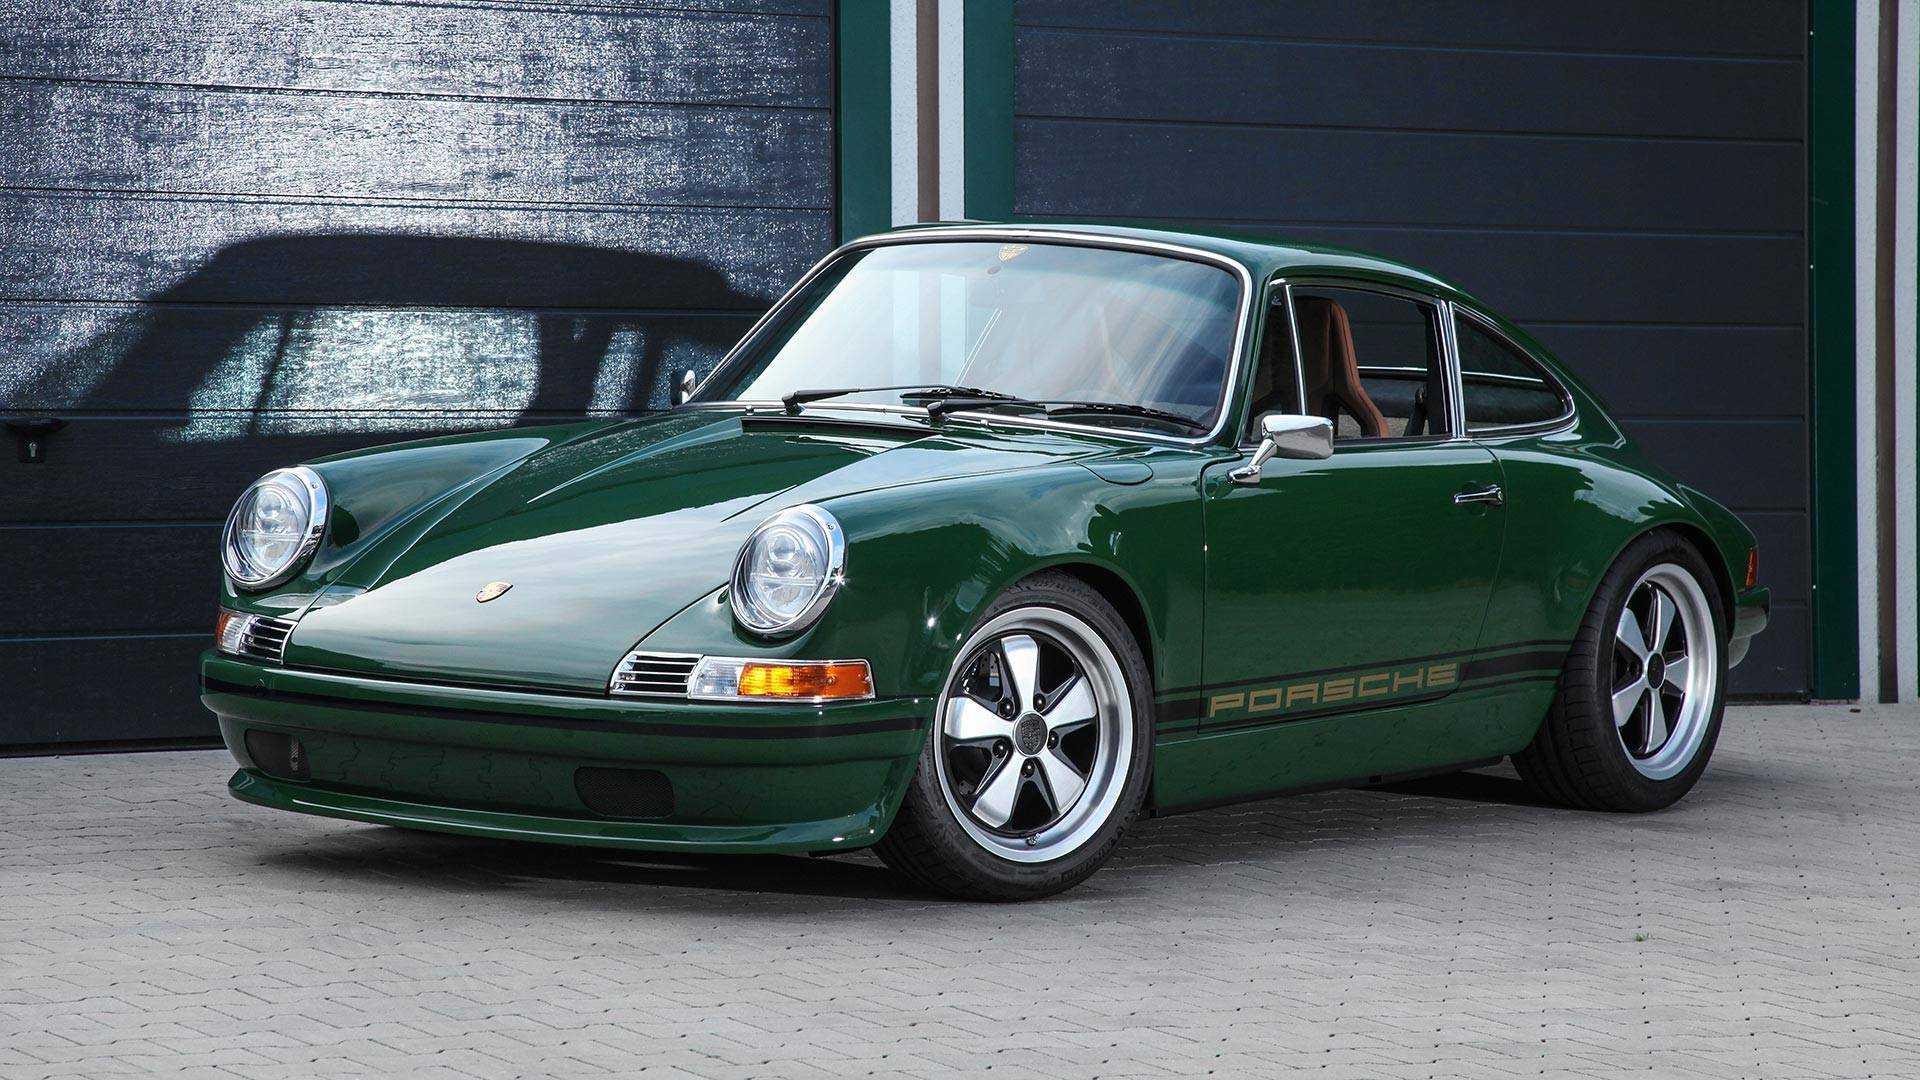 964 Porsche 911 Gets Vintage Look From German Tuner